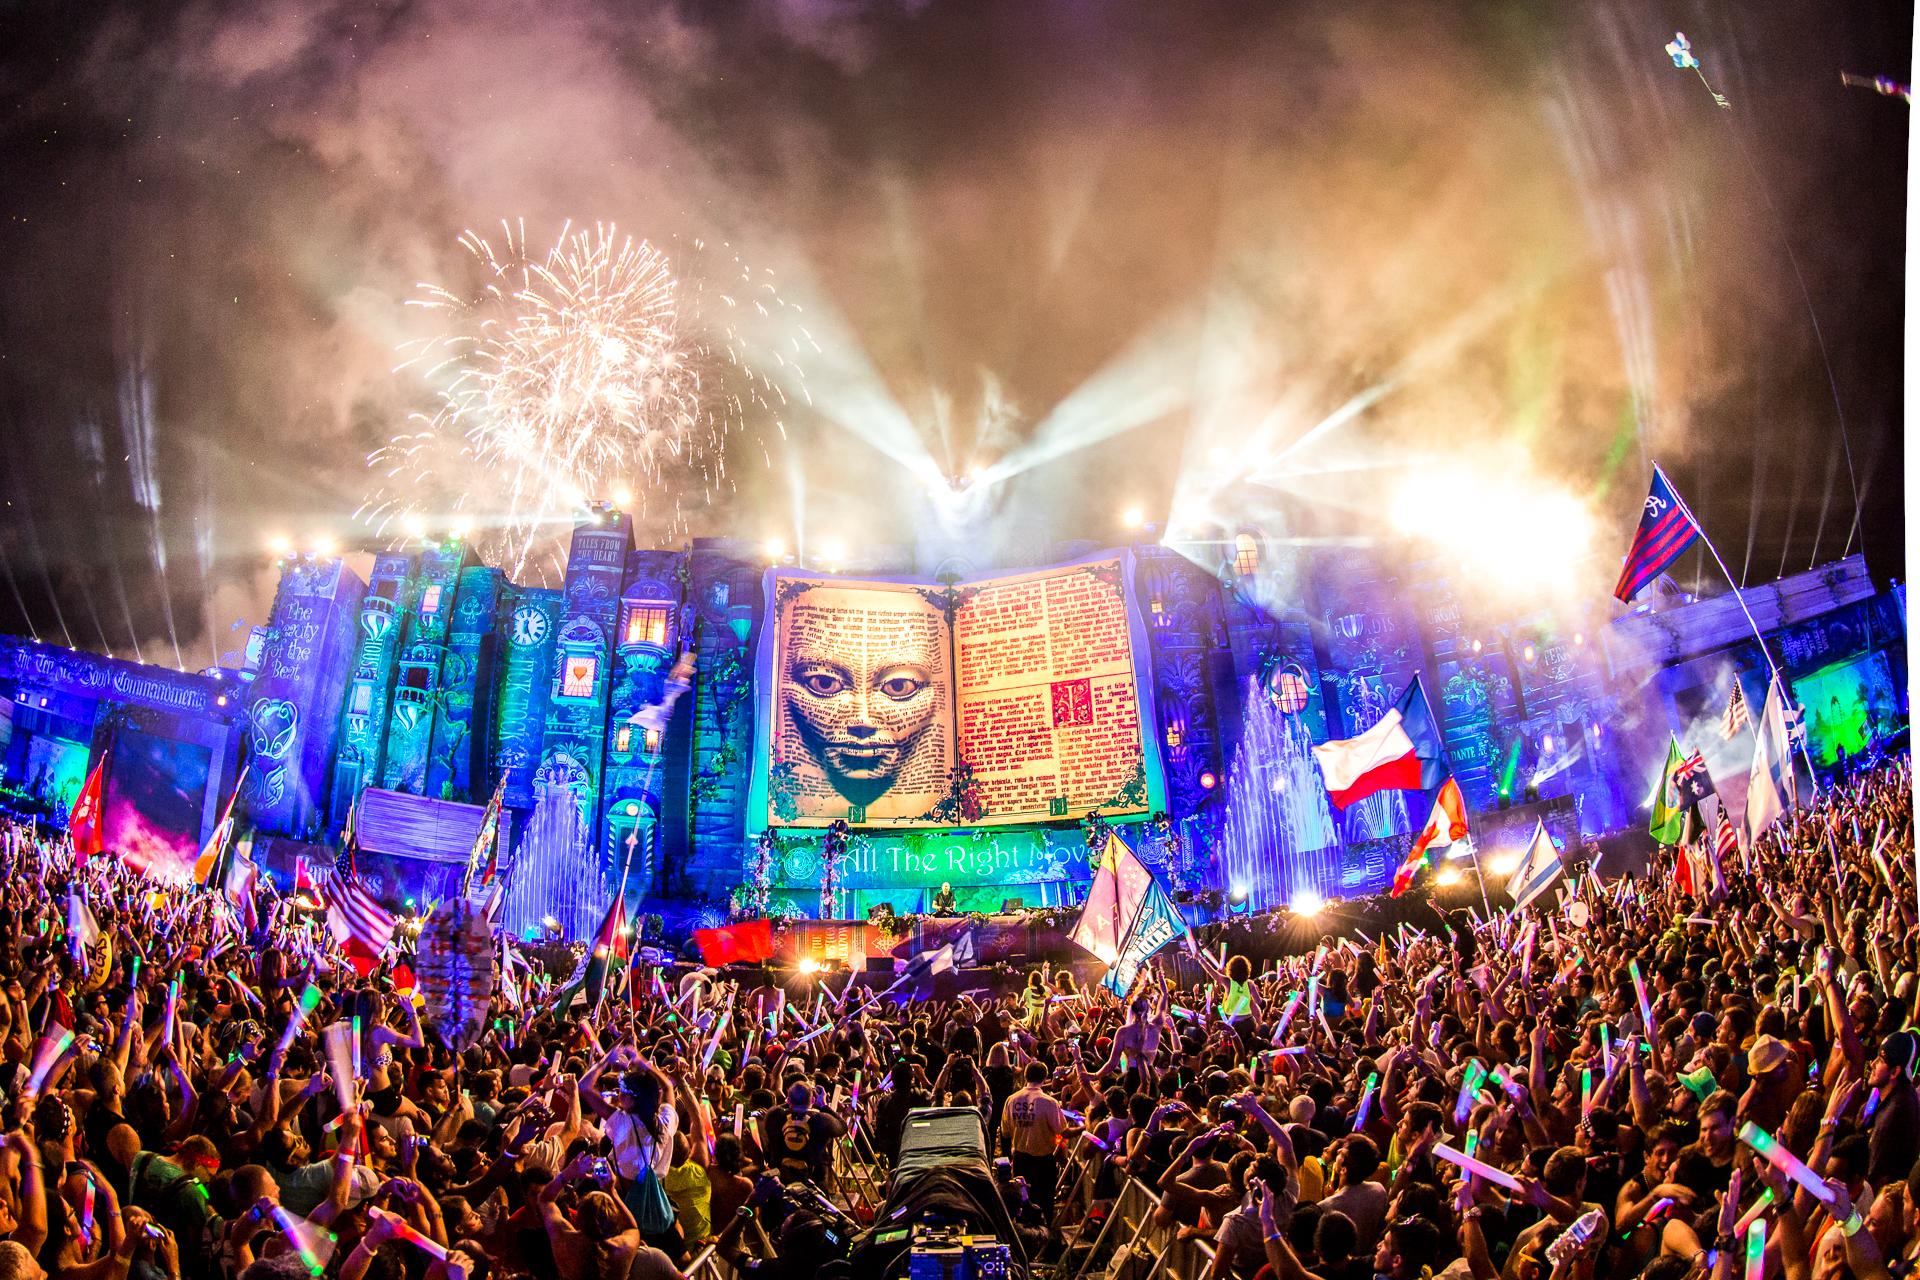 Tomorrow World 2016